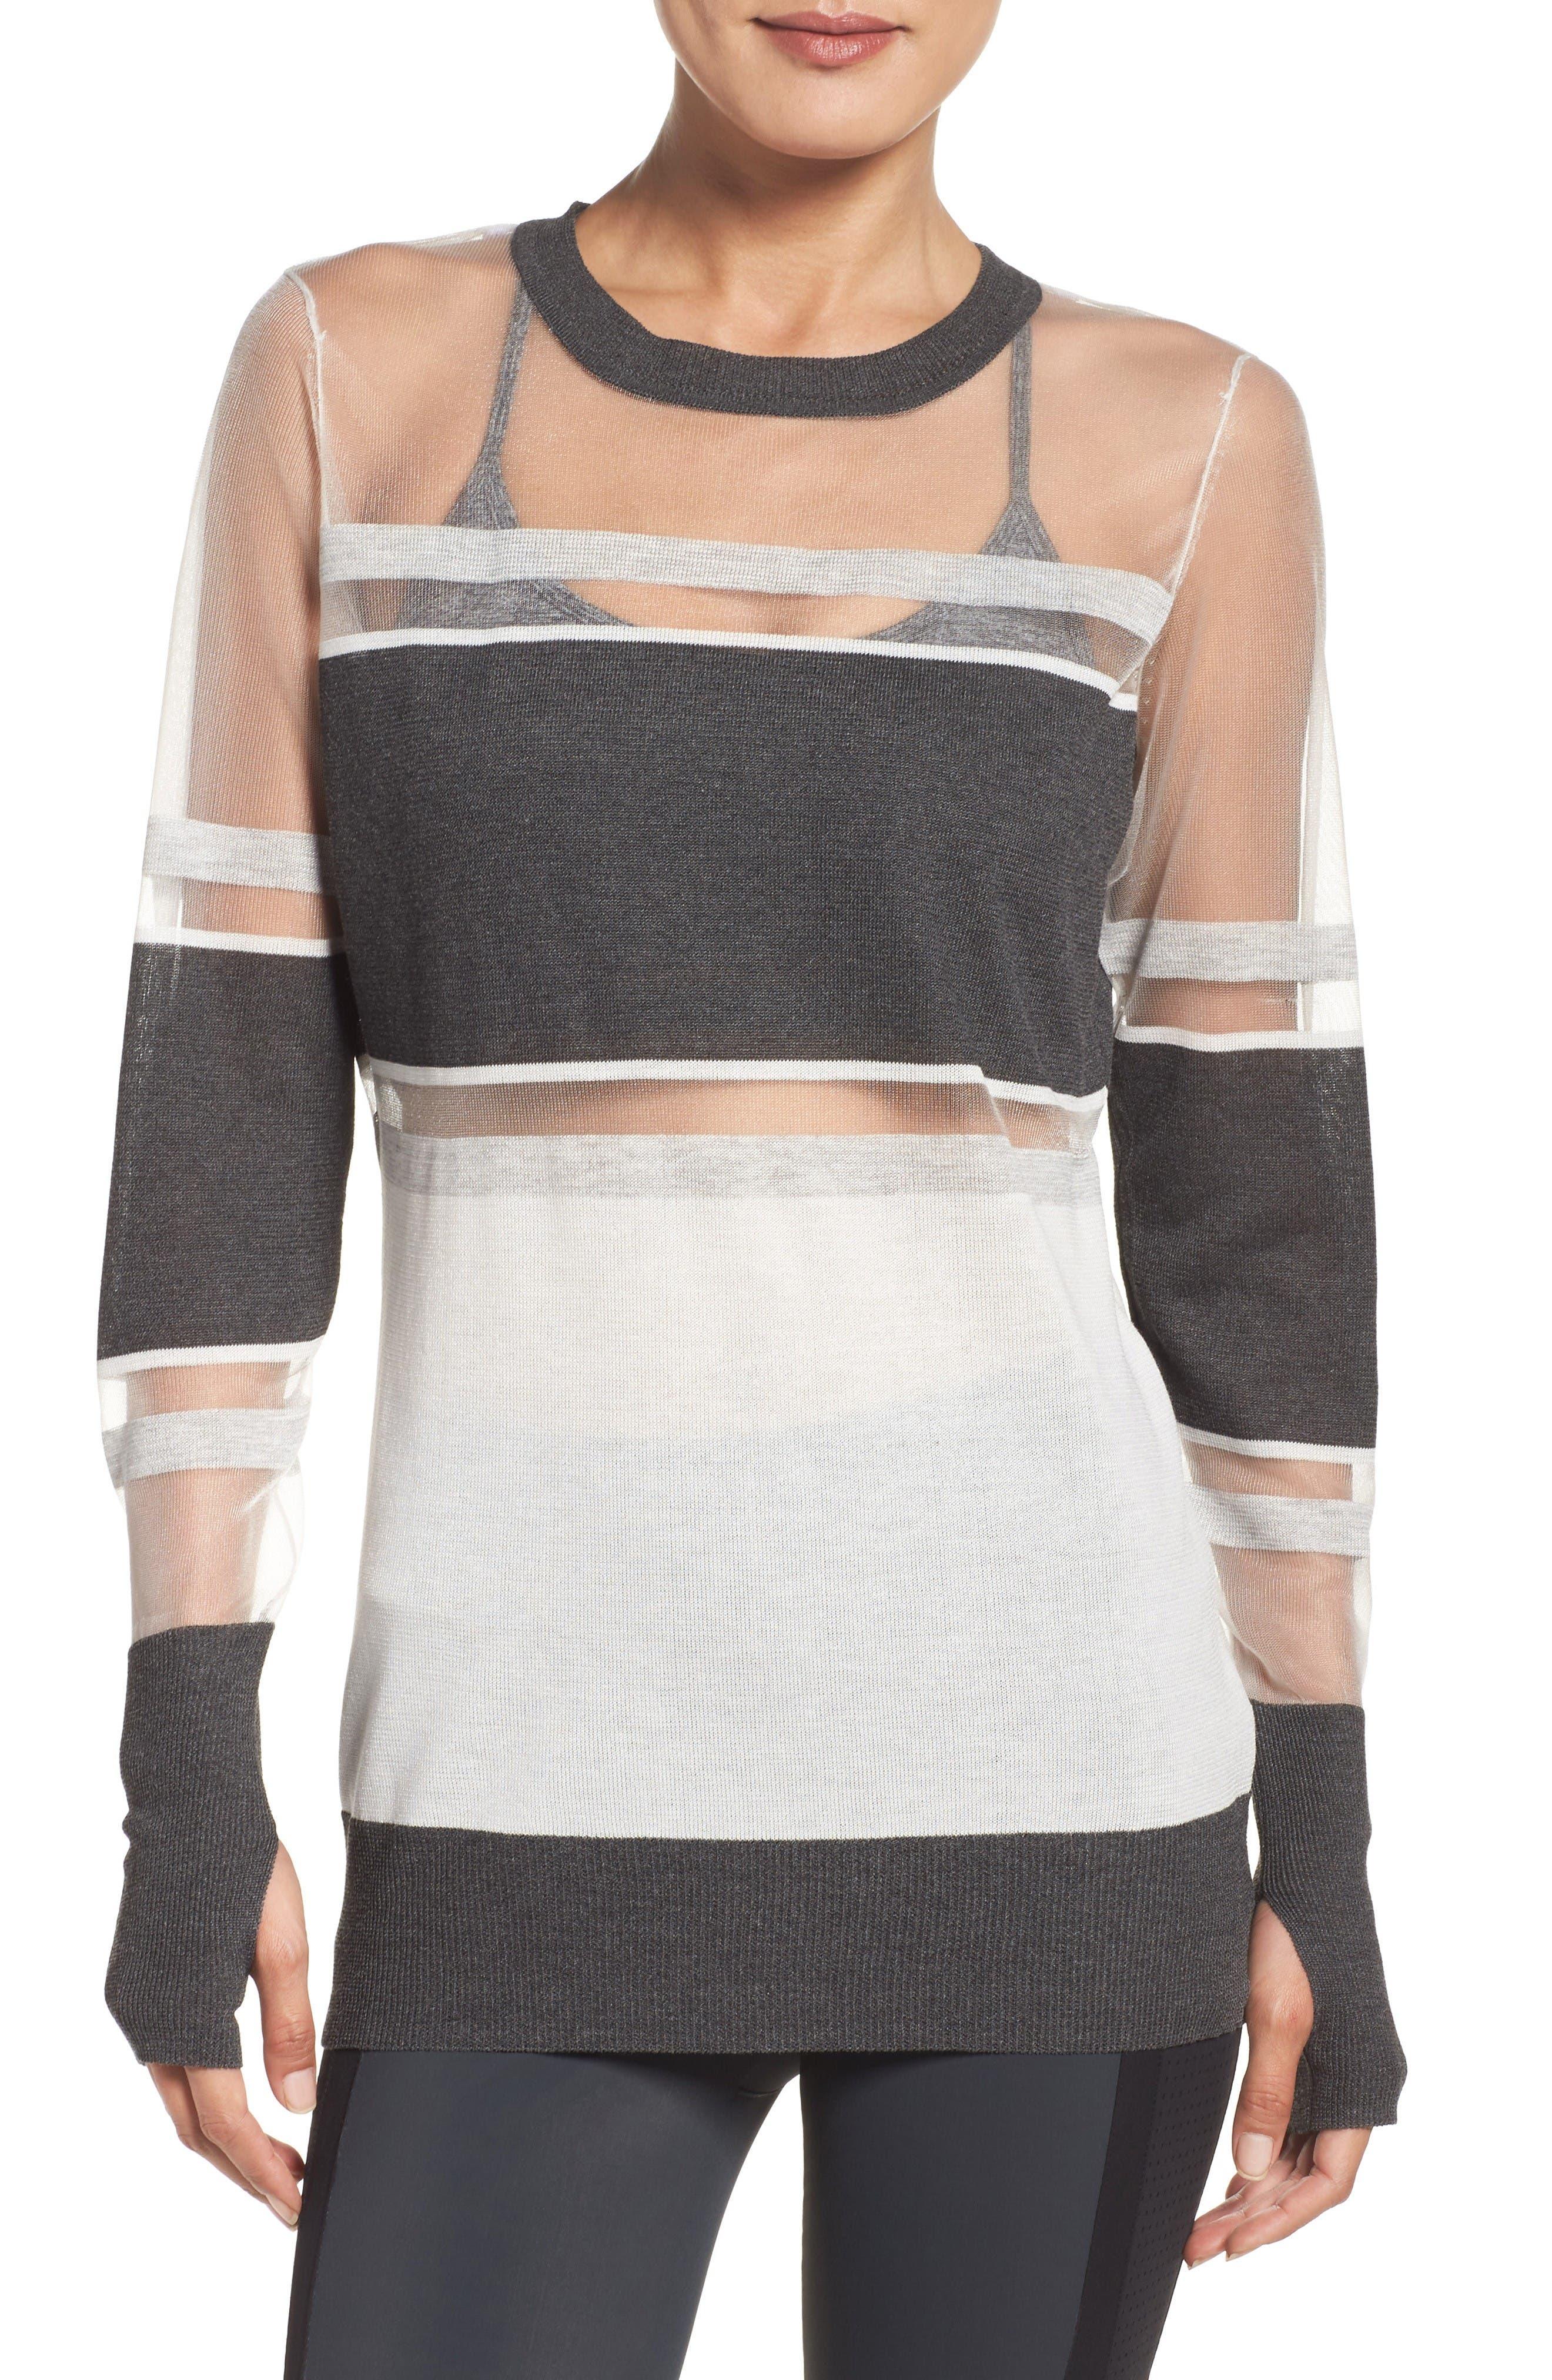 Blanc Noir Vision Mesh Sweatshirt